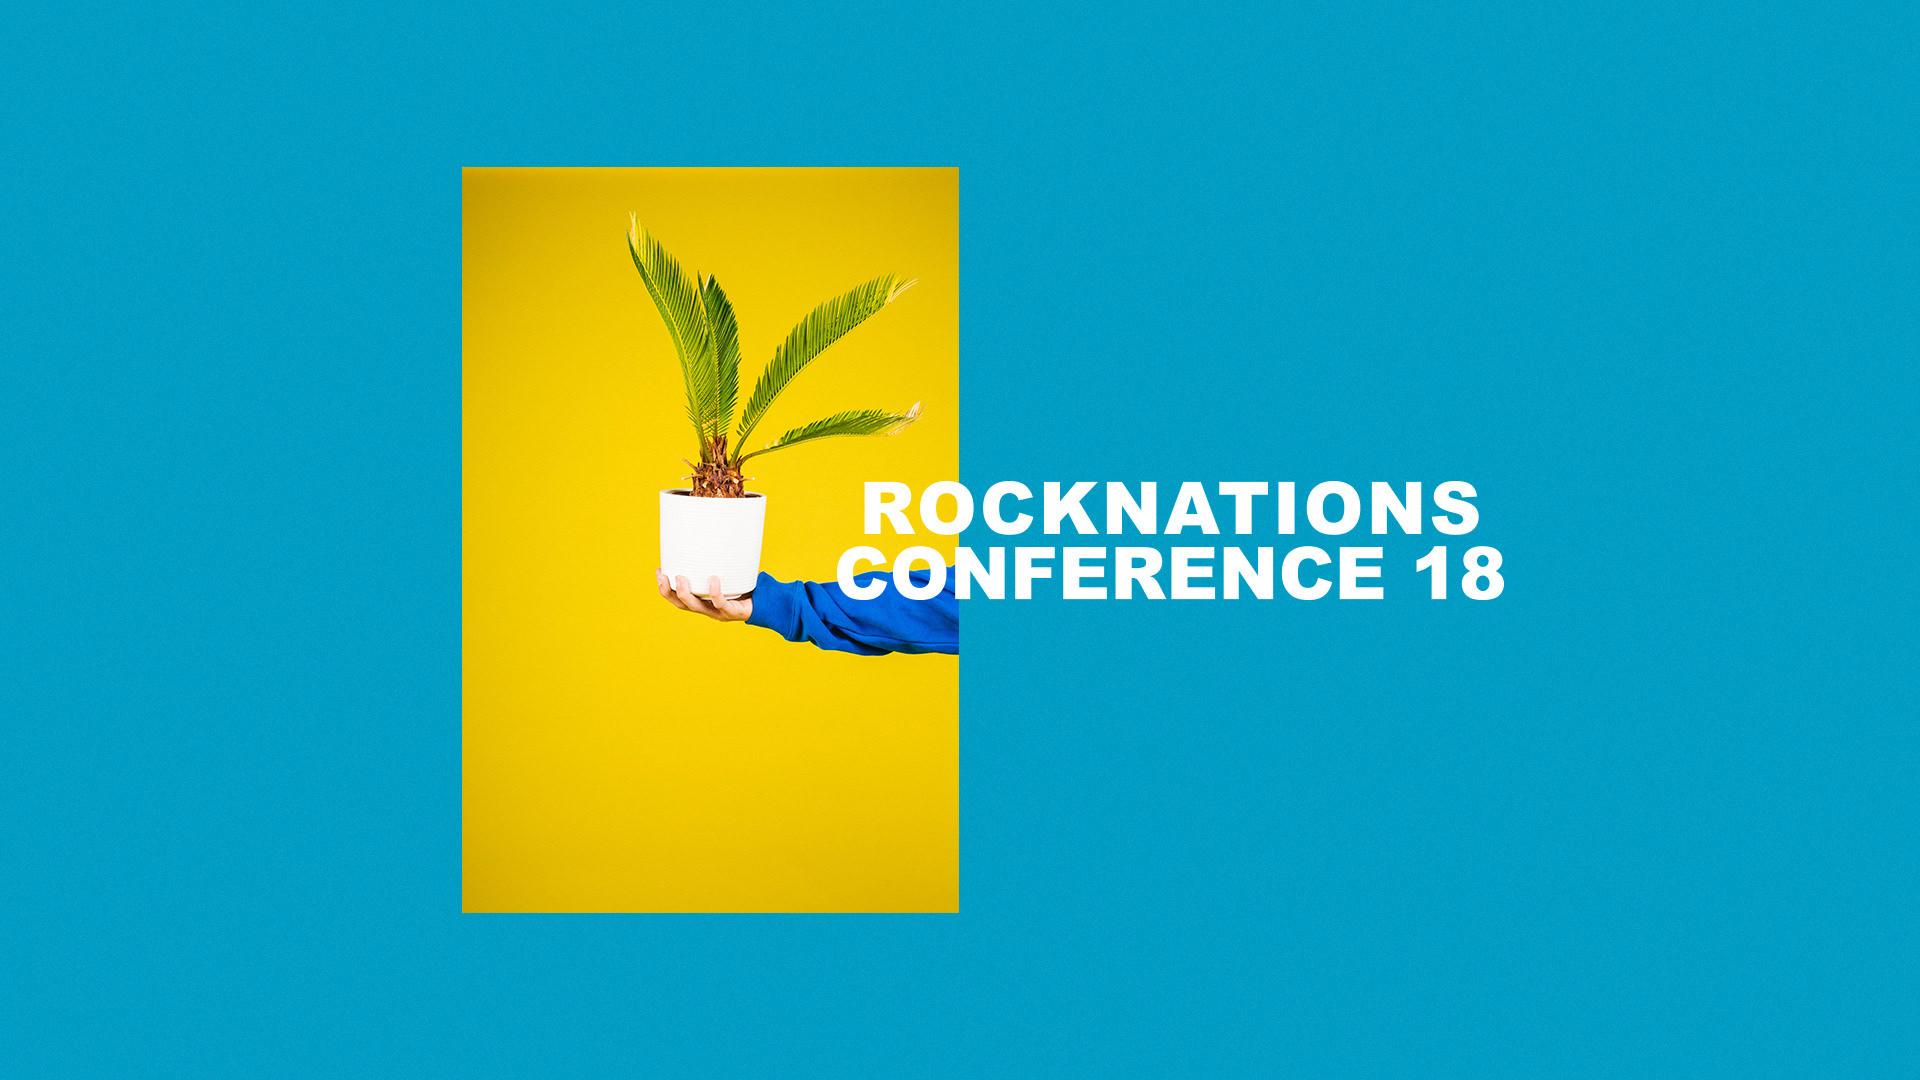 Rocknations Conference 2018